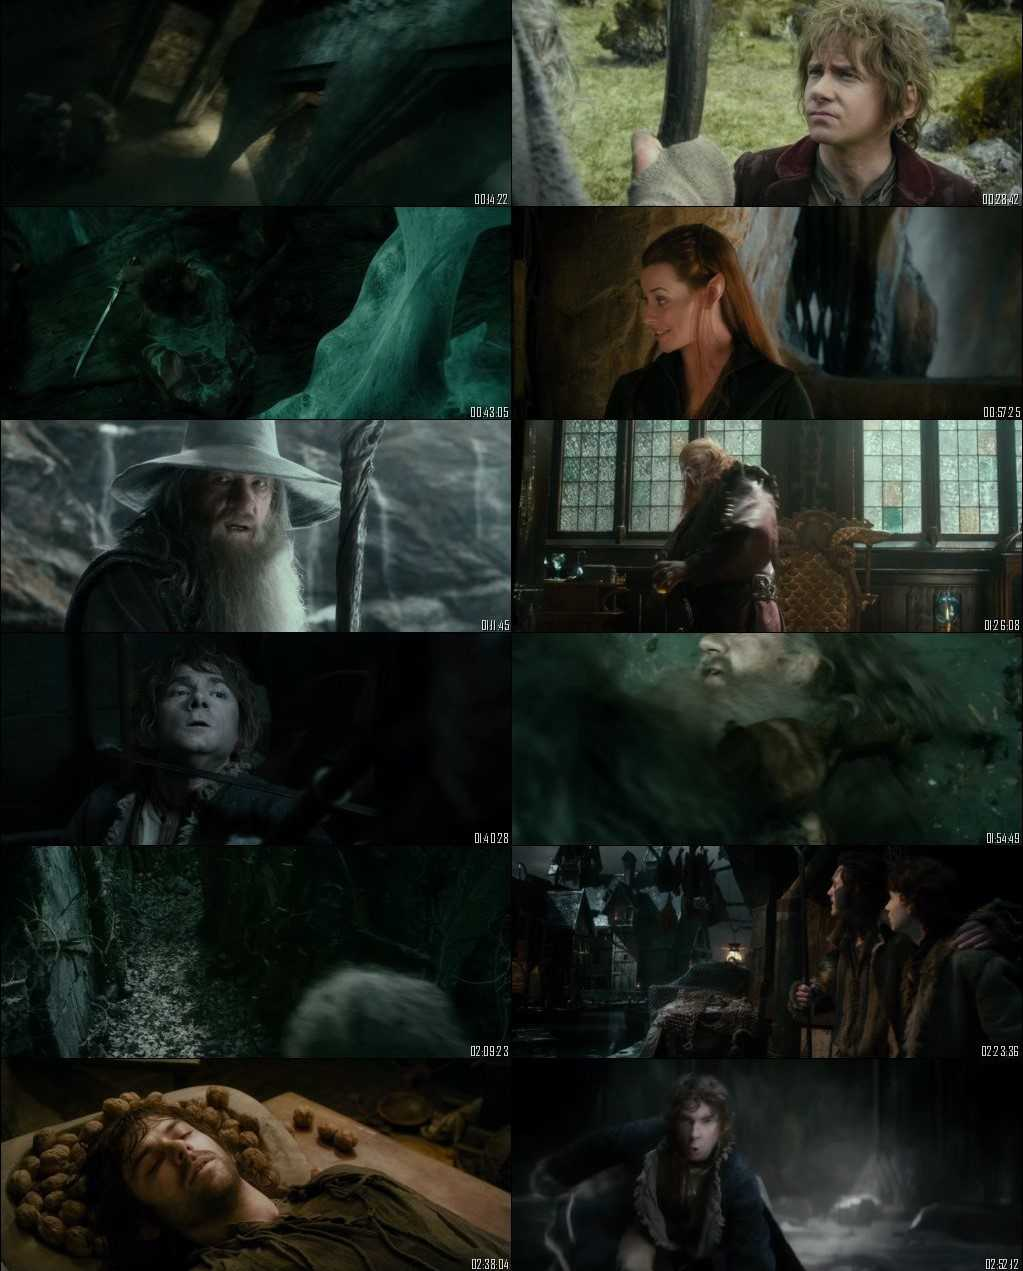 The Hobbit: The Desolation of Smaug 2013 Screenshot